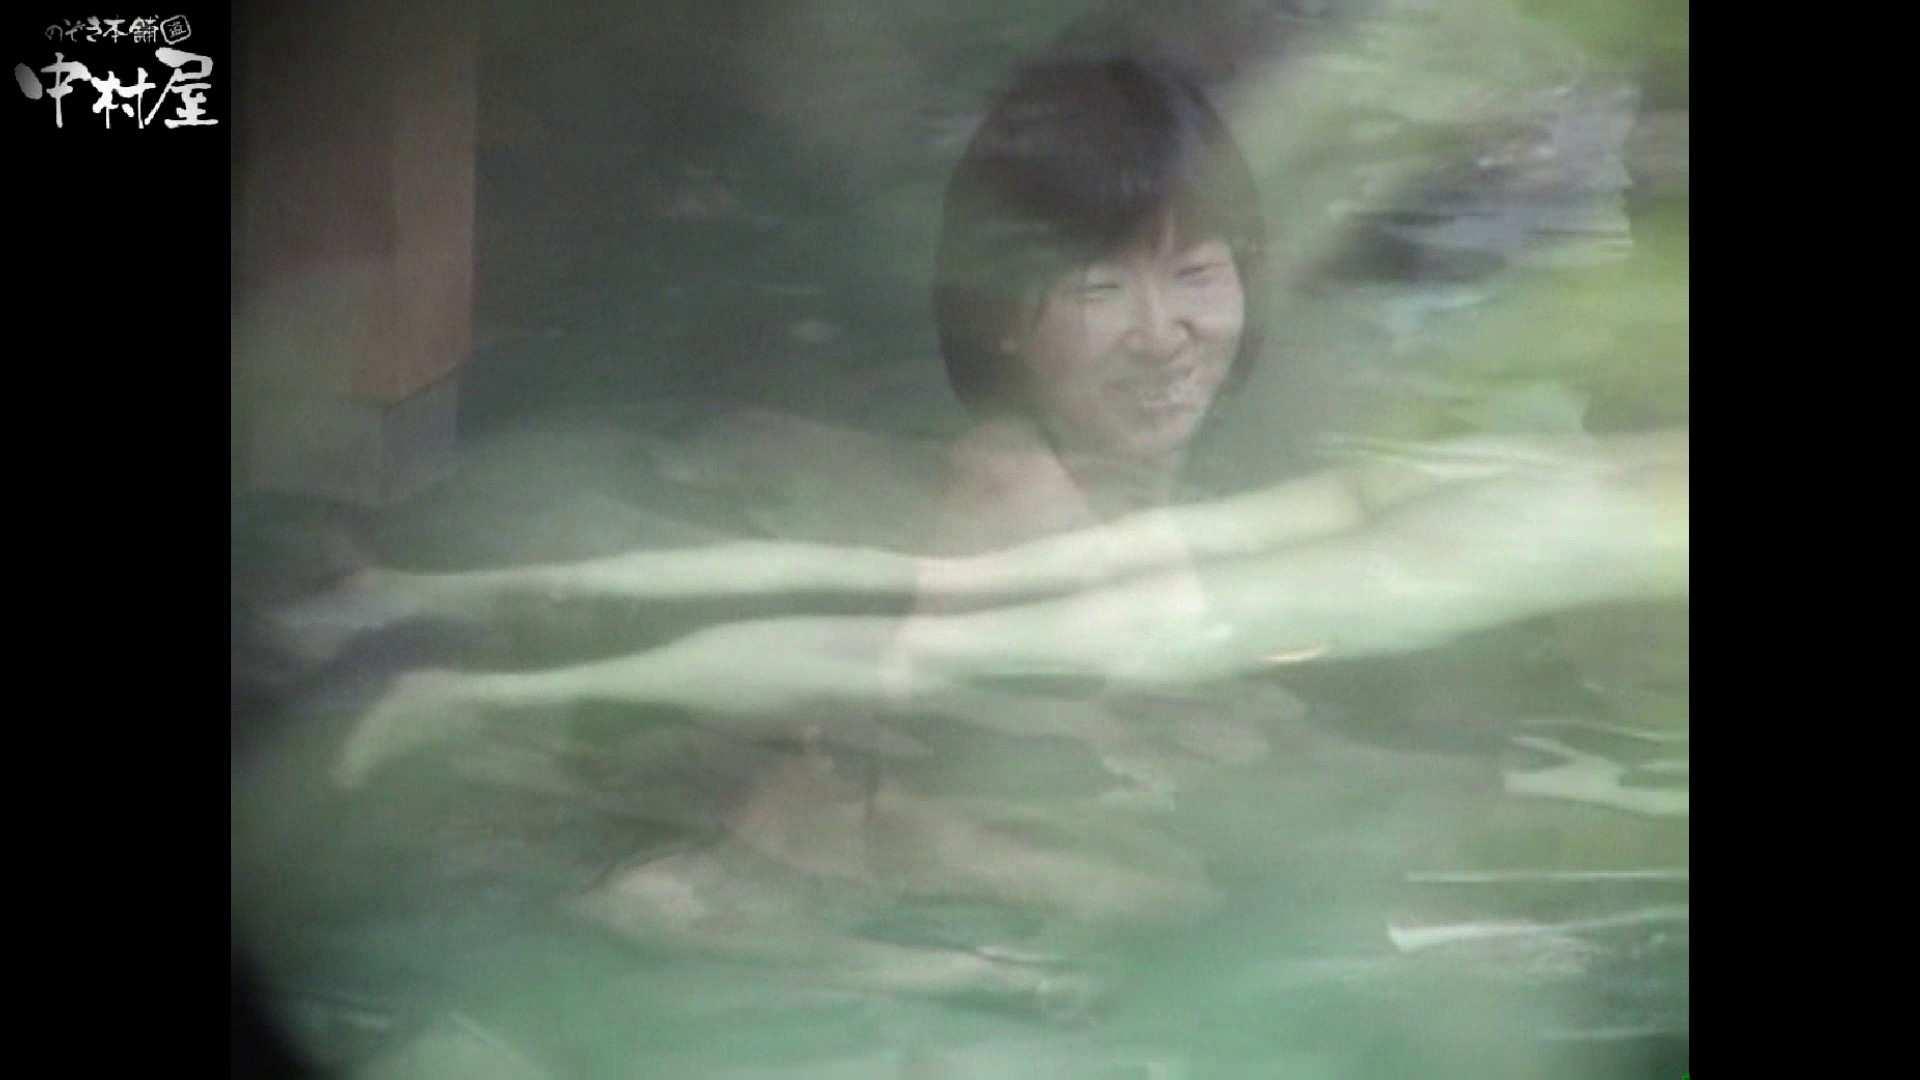 Aquaな露天風呂Vol.953 盗撮師作品  70pic 30